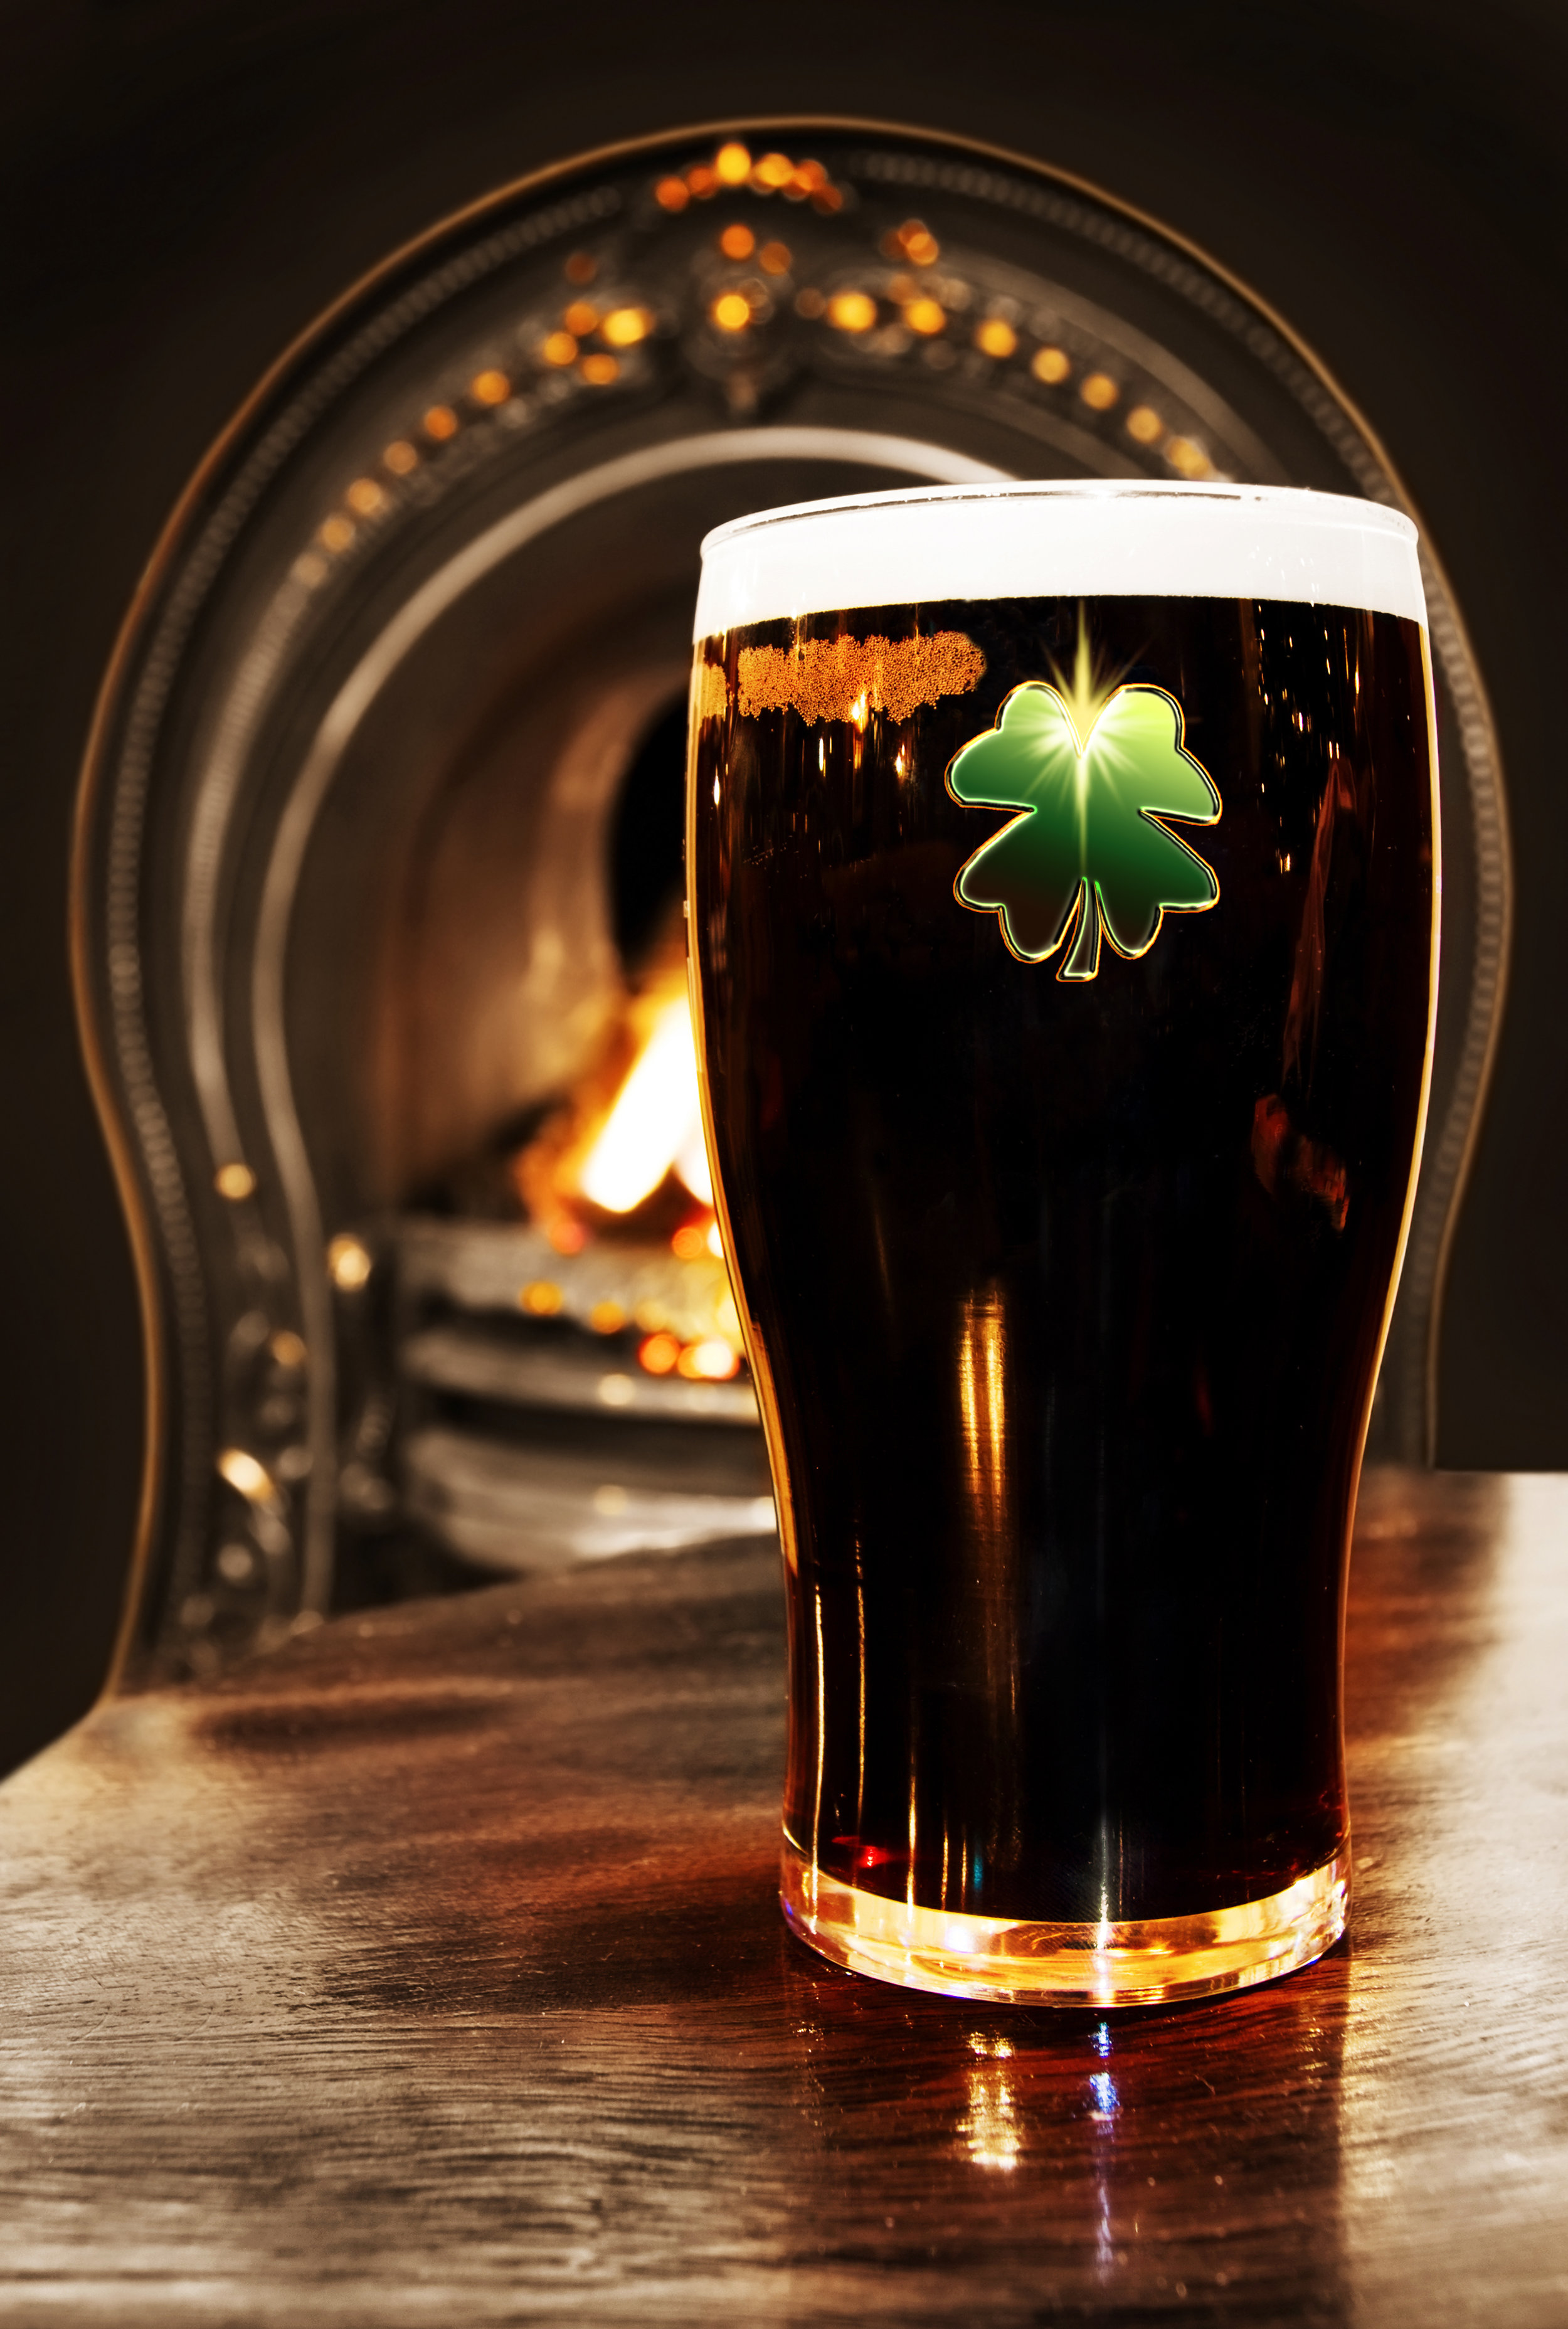 irland_dublin_bigstock-Saint-Patrick-s-Irish-Black-Be-4396990.jpg